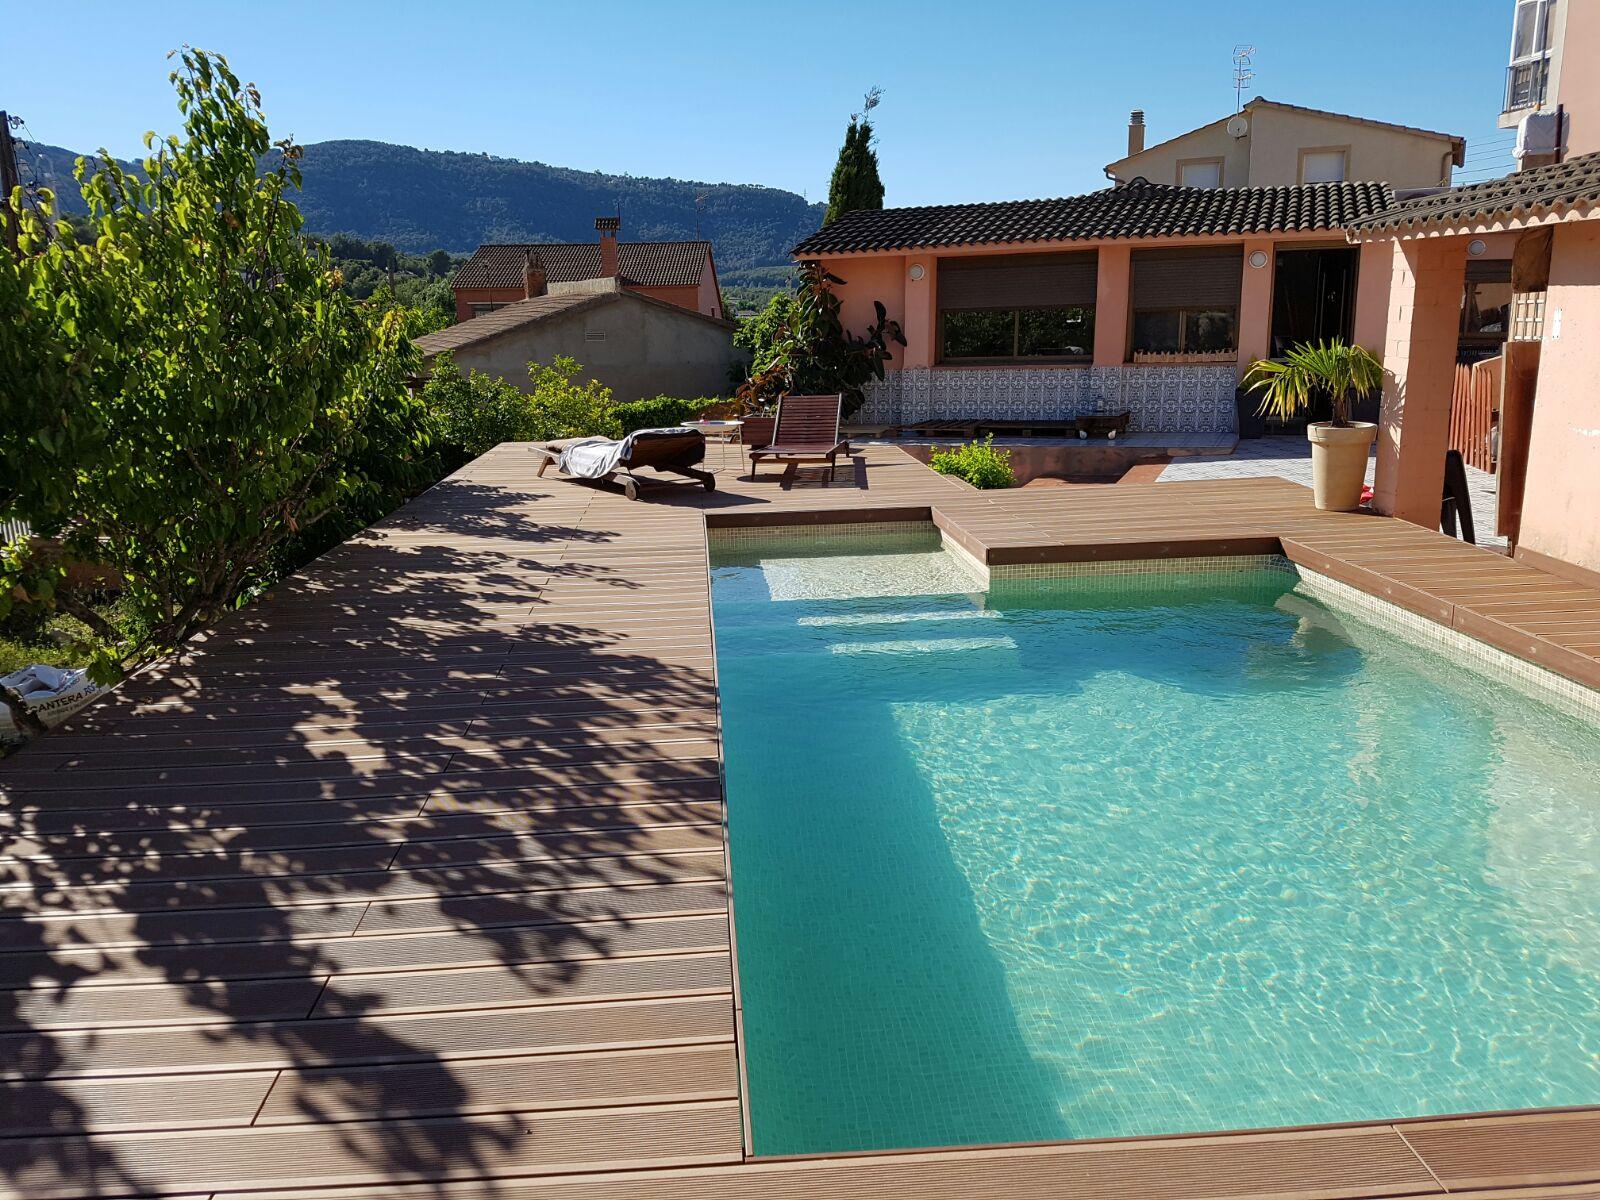 Construcci n de piscinas aquadynamics for Construccion de piscinas